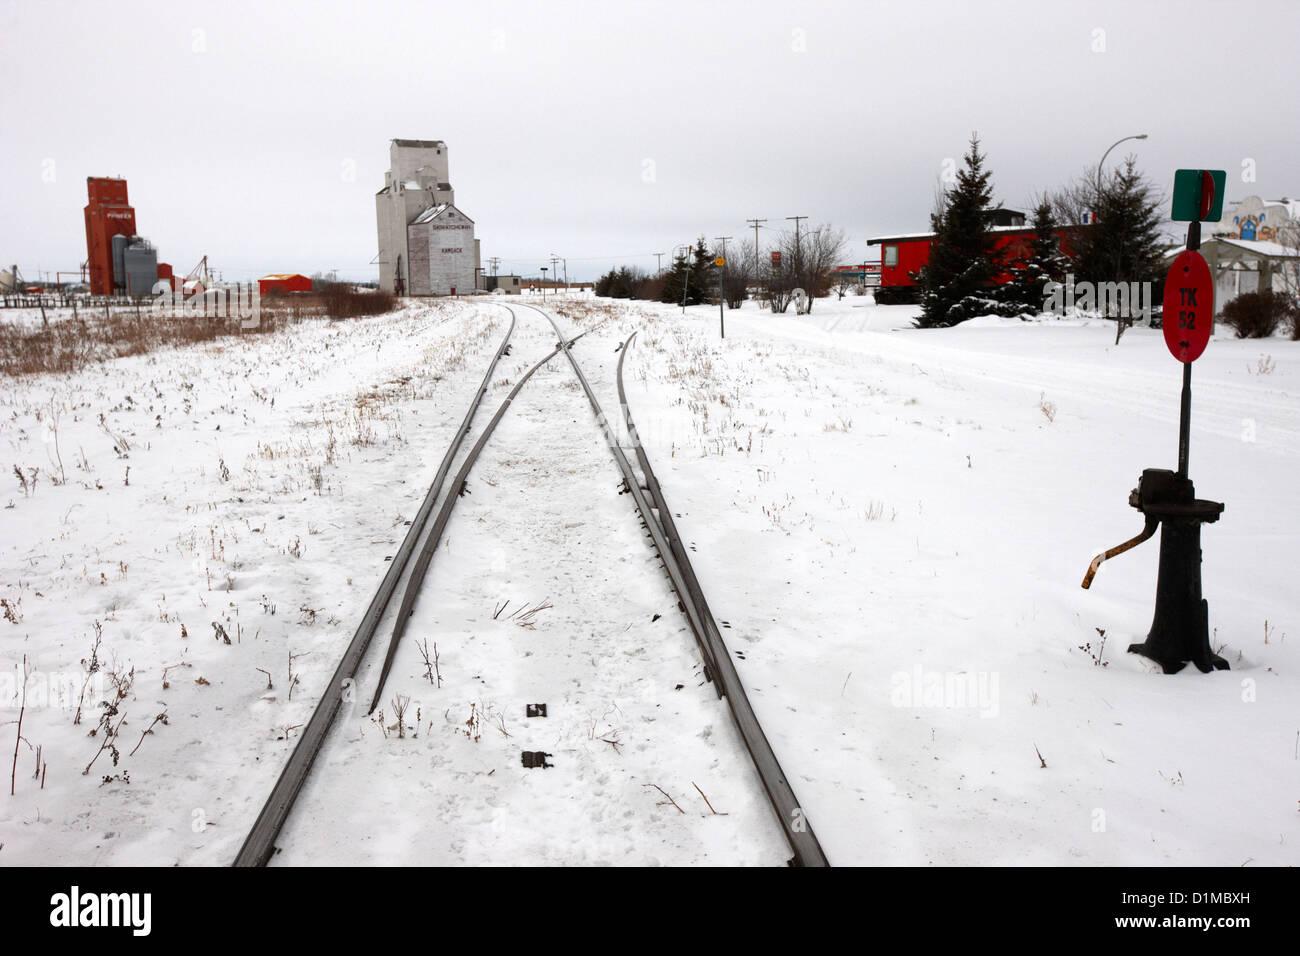 CN canadian national railway tracks and grain silos Kamsack Saskatchewan Canada - Stock Image